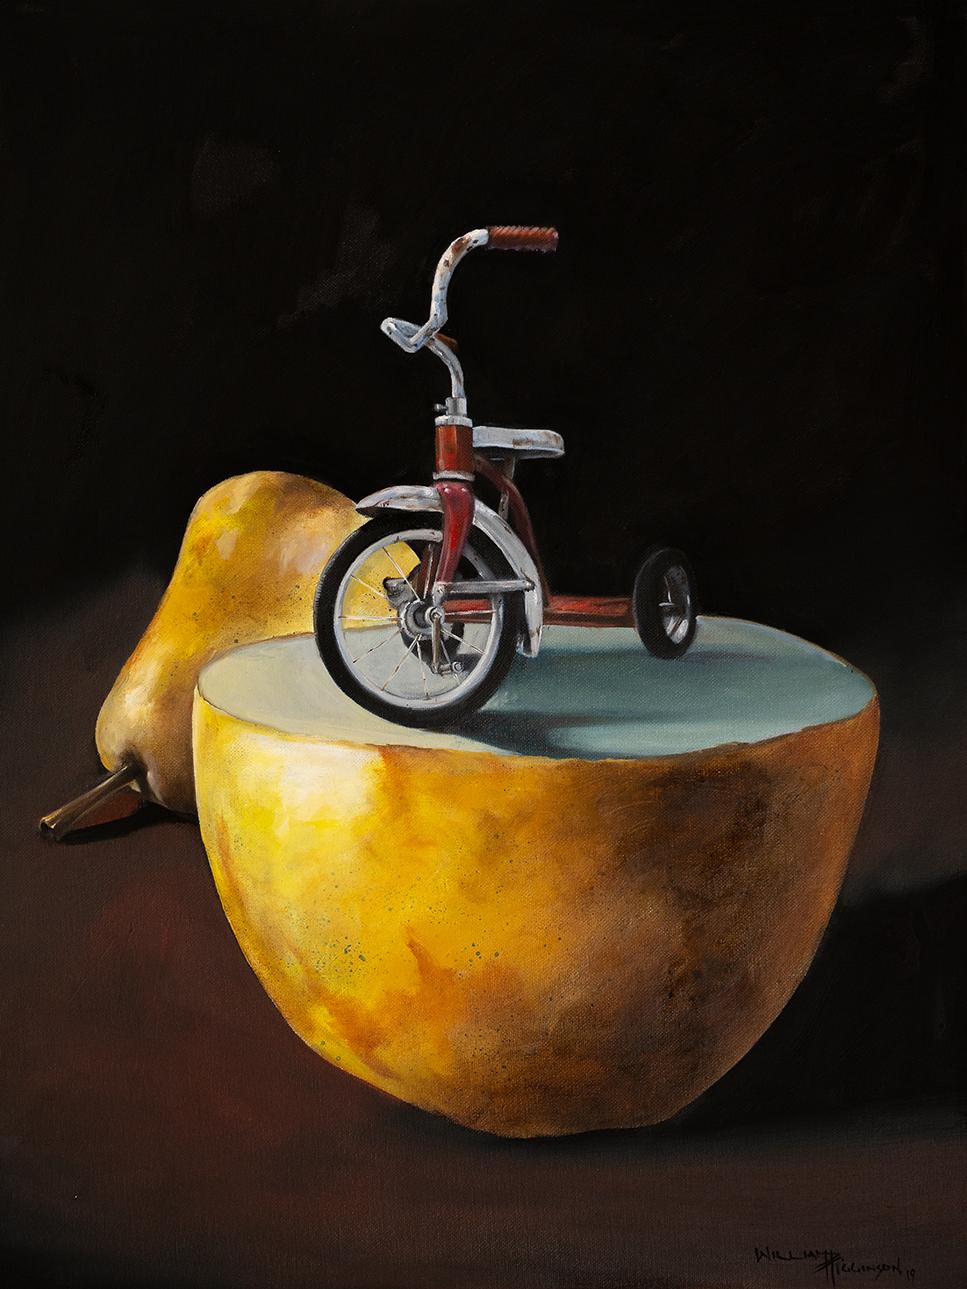 Pyriforma+incubandi+tres+wheeler+surrealism+oil+painting+william+d+higginson.jpg